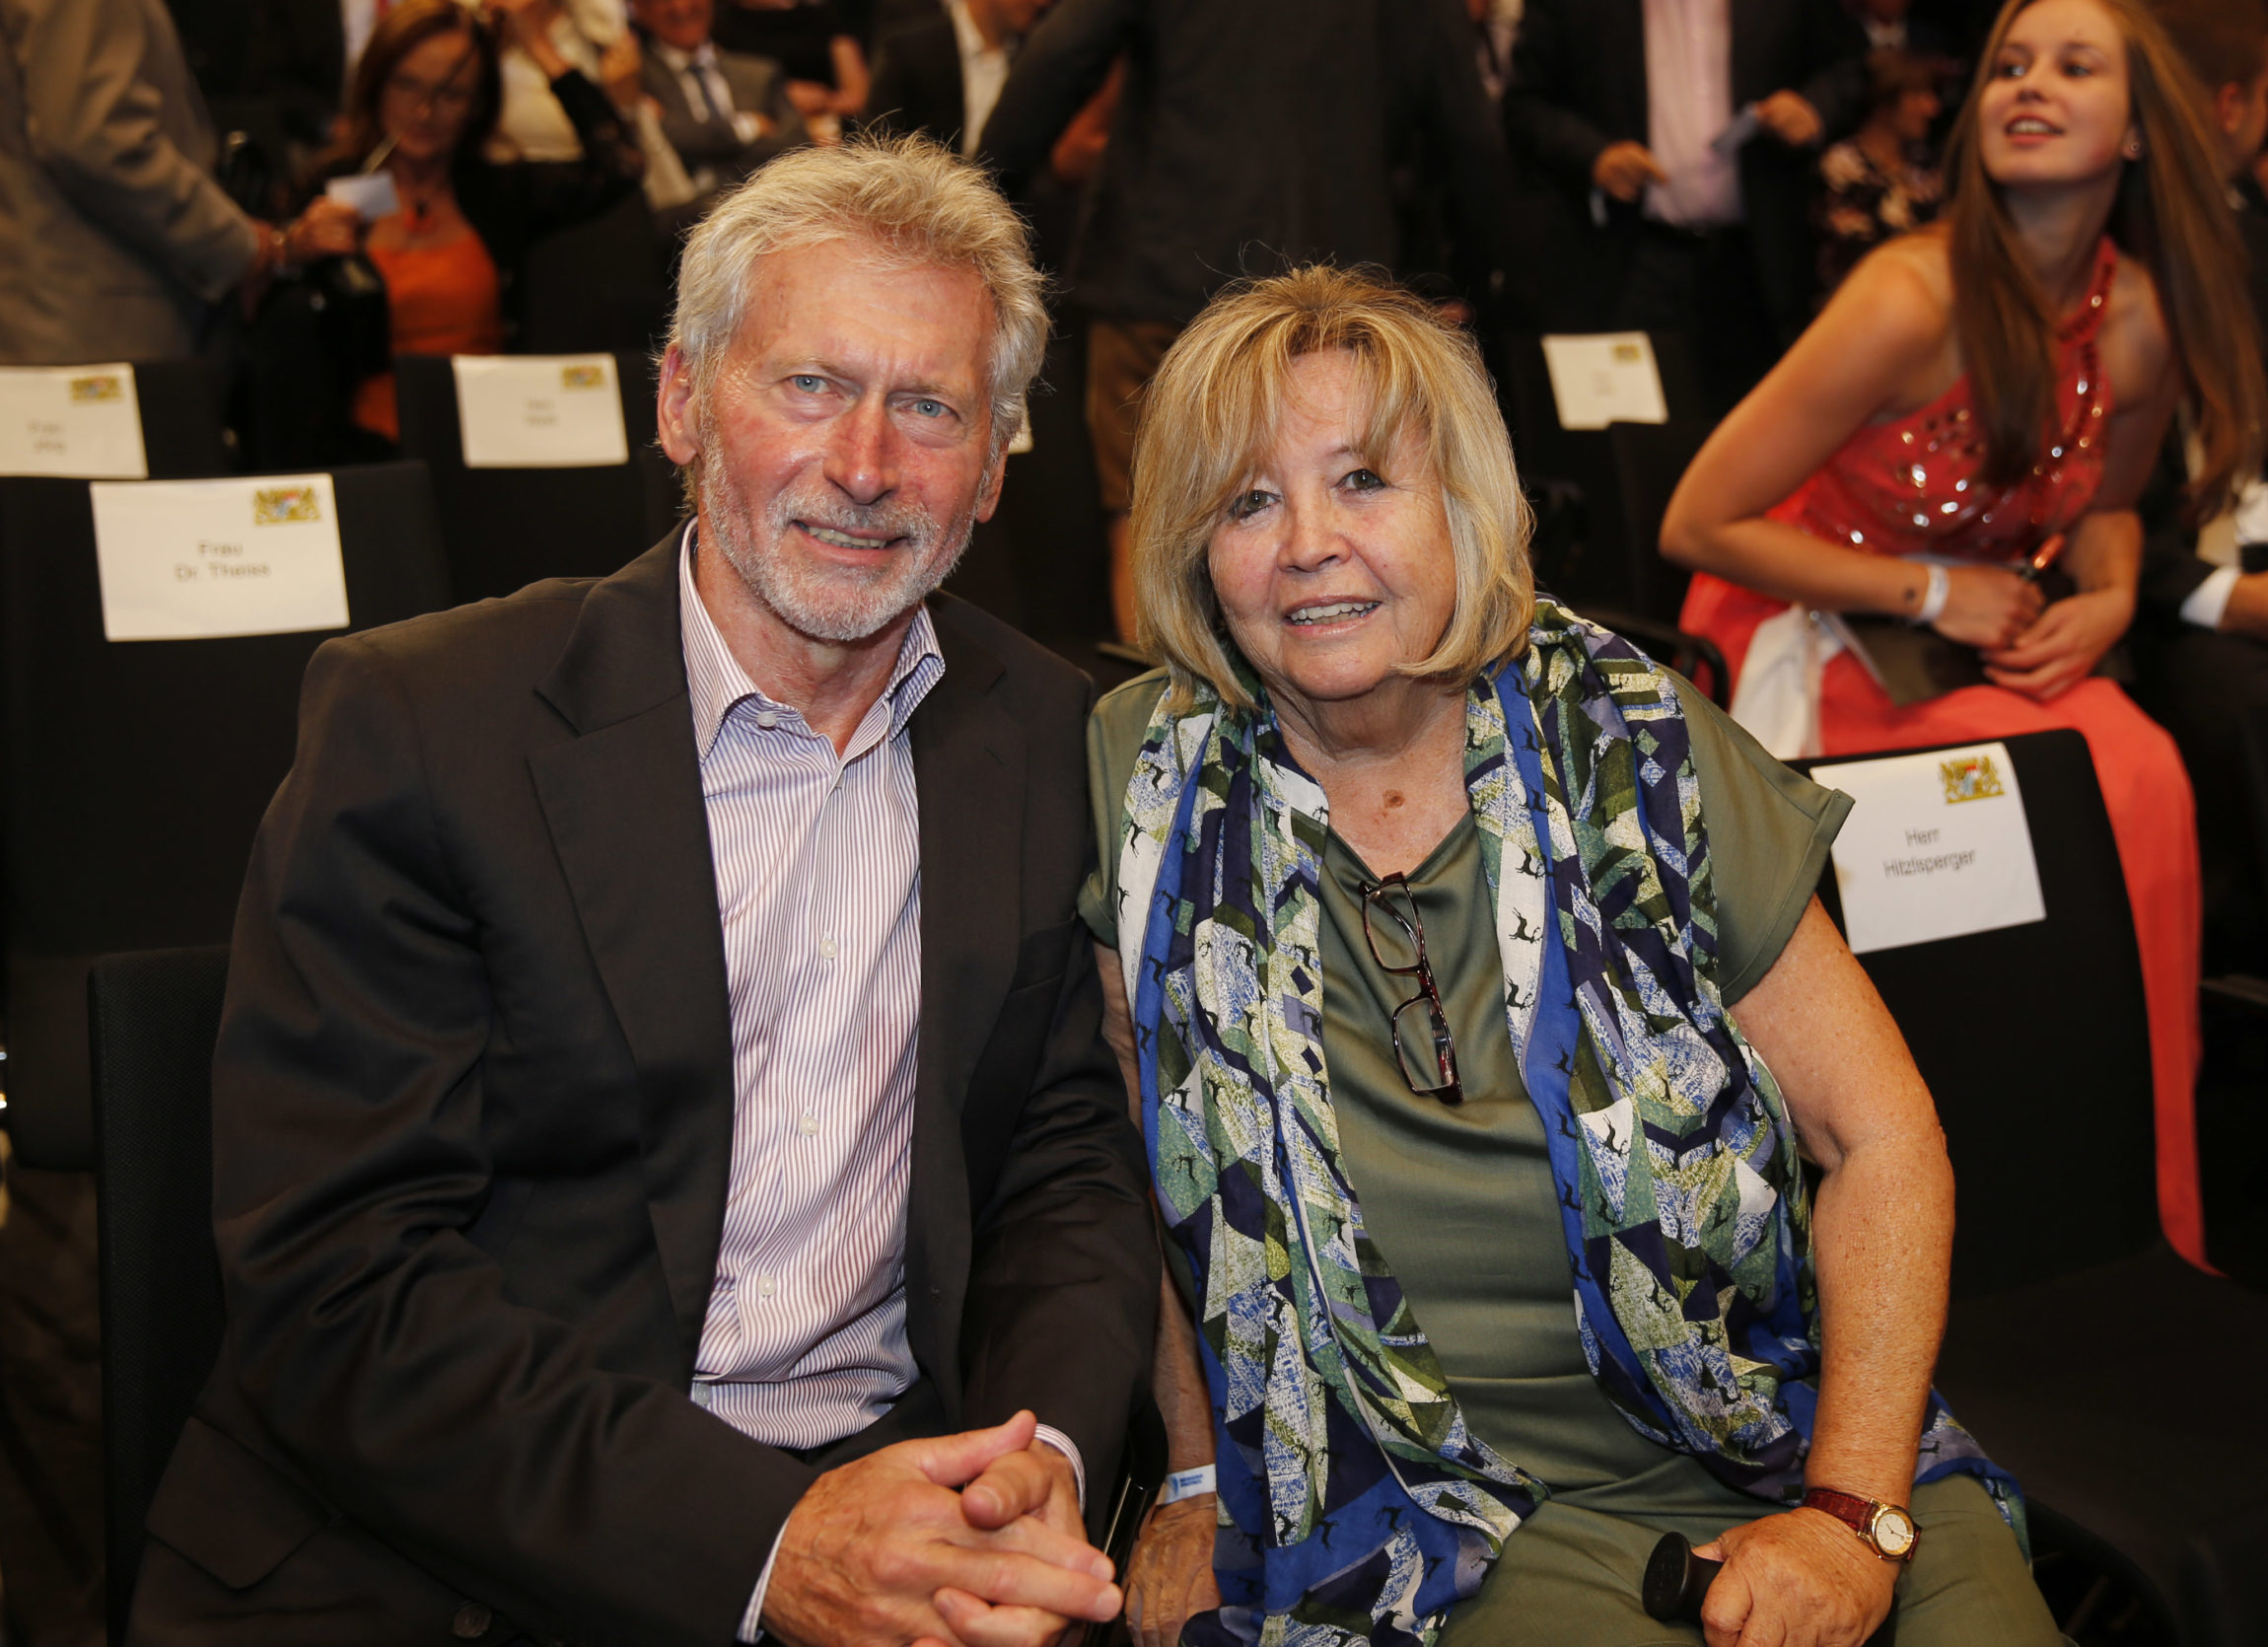 Paul und Hildegard Breitner